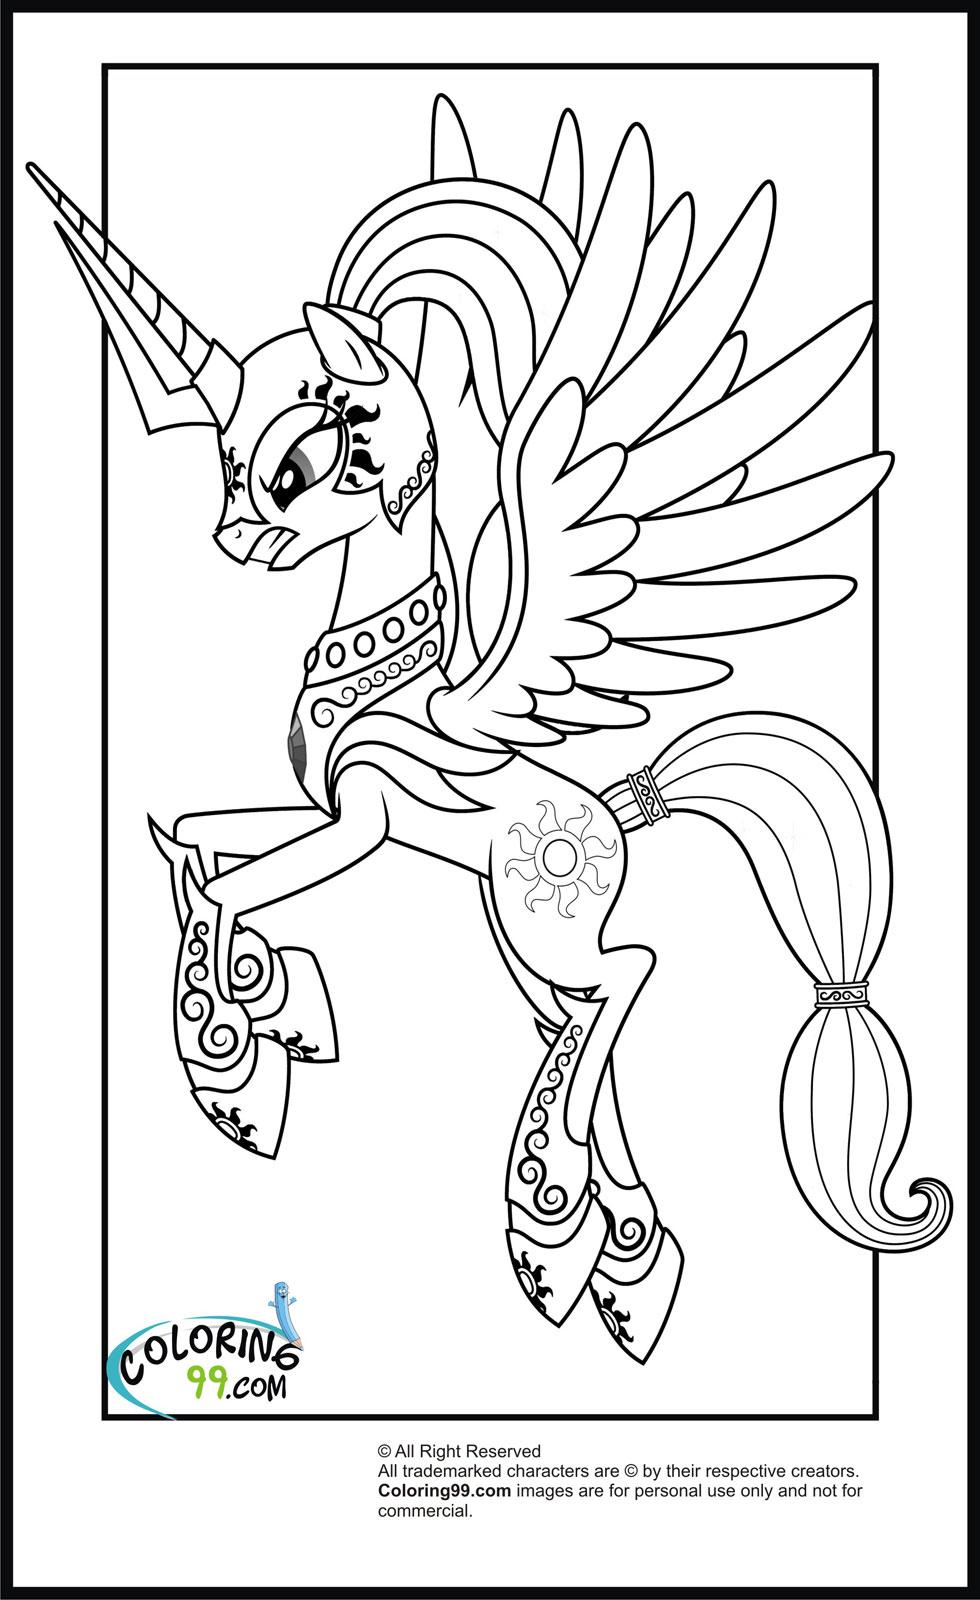 Drawn my little pony custom Coloring Pony My pony